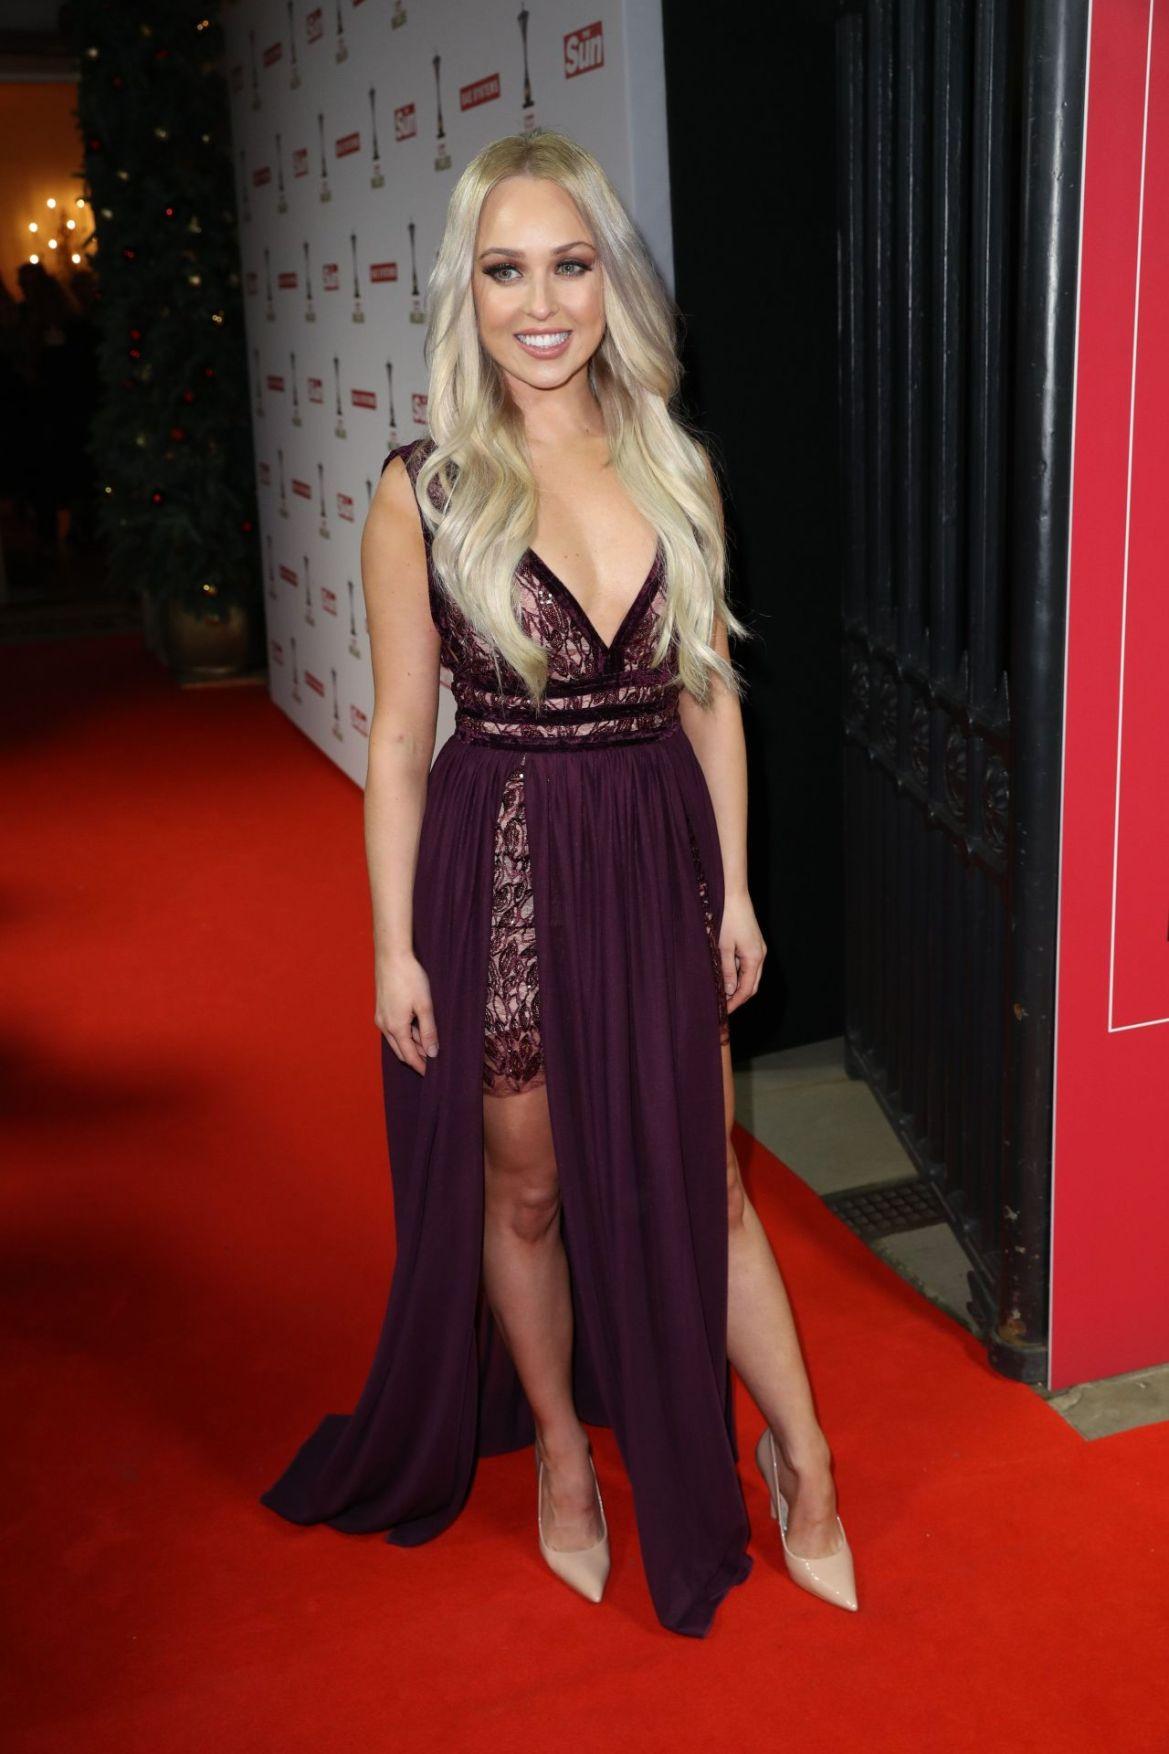 Jorgie Porter – The Sun Military Awards 2018